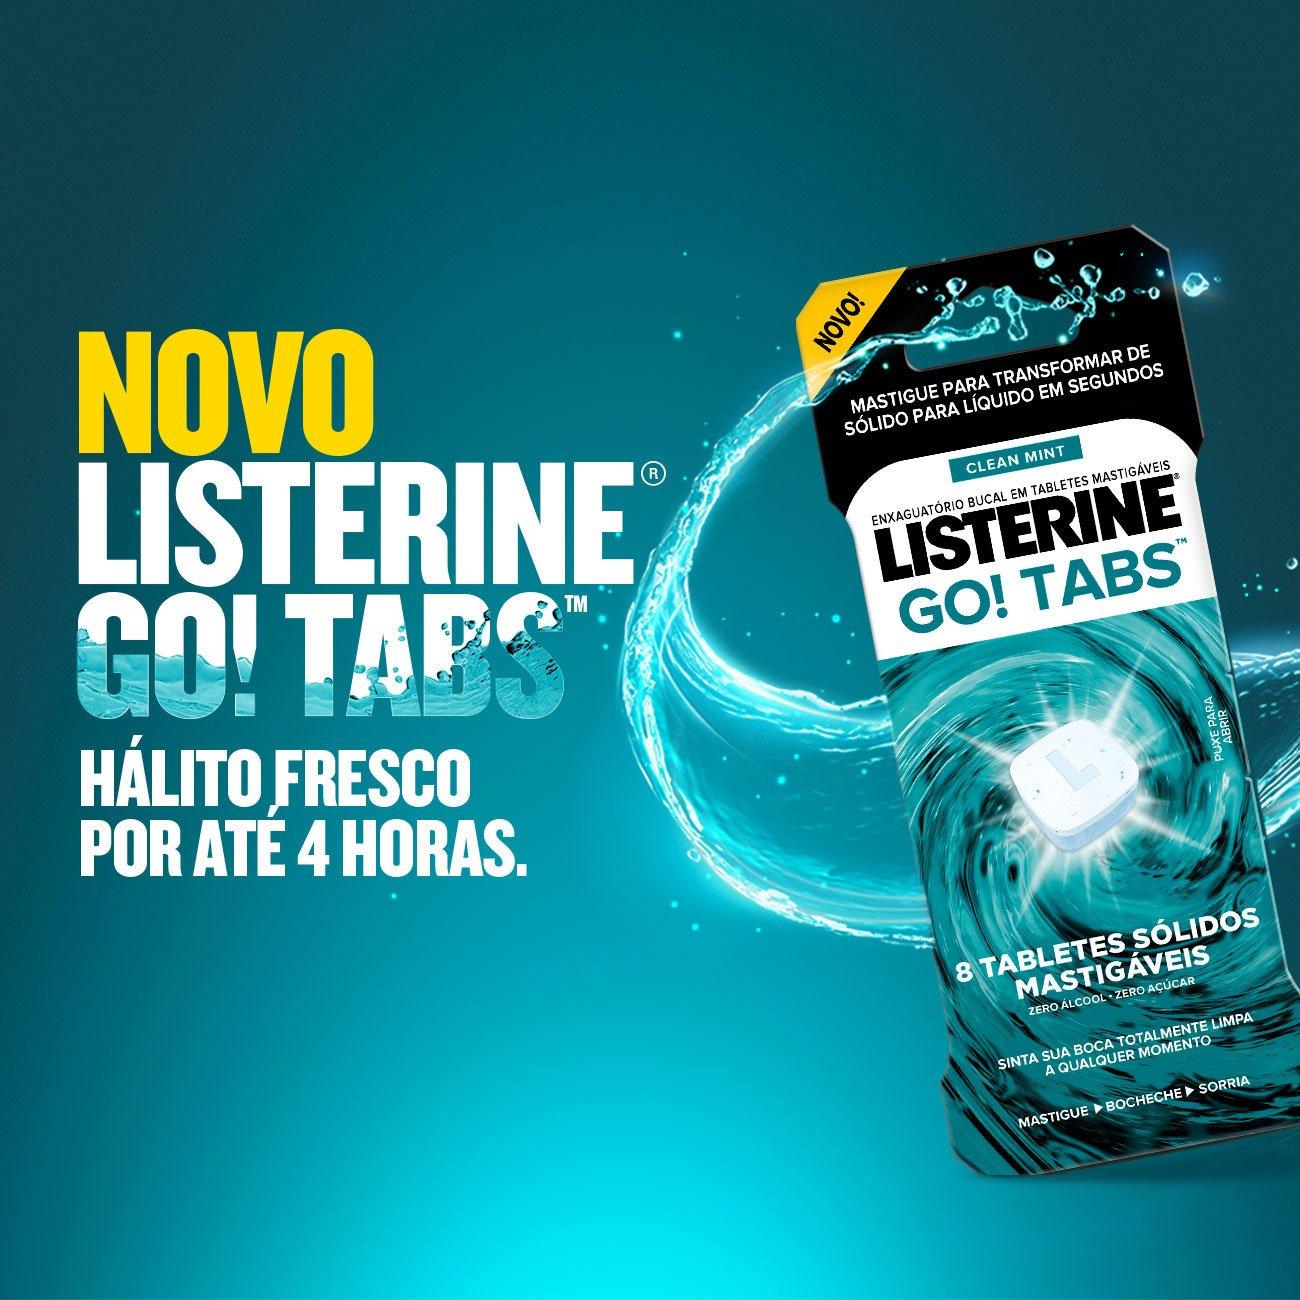 NOVO LISTERINE® GO! TABS™